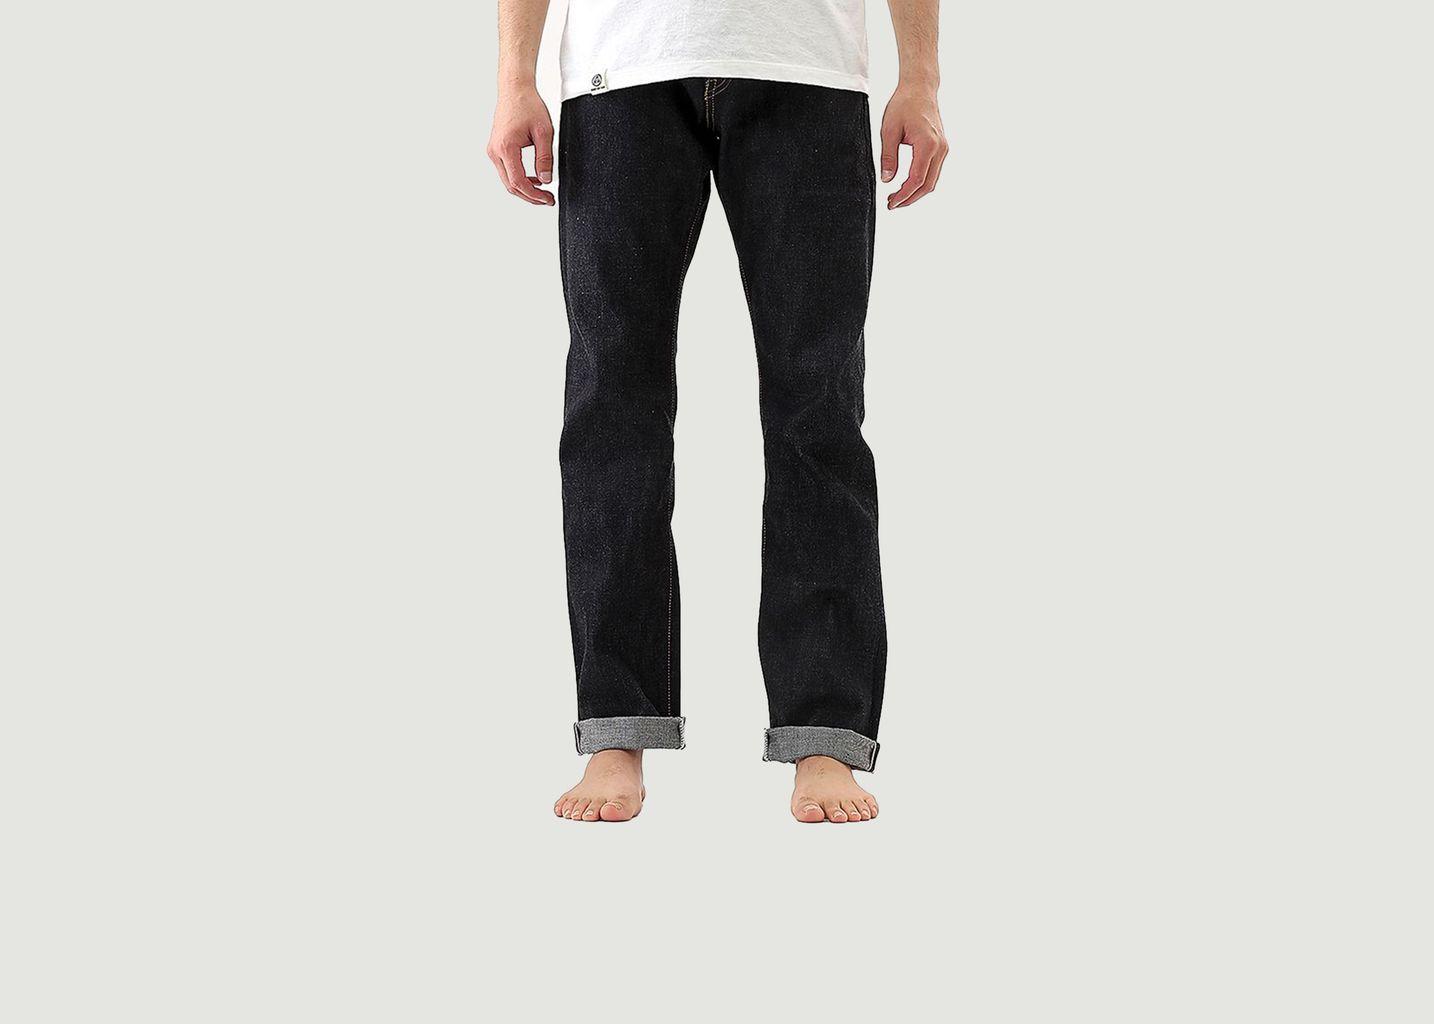 Jean 0605 12oz Natural Tapered - Momotaro Jeans